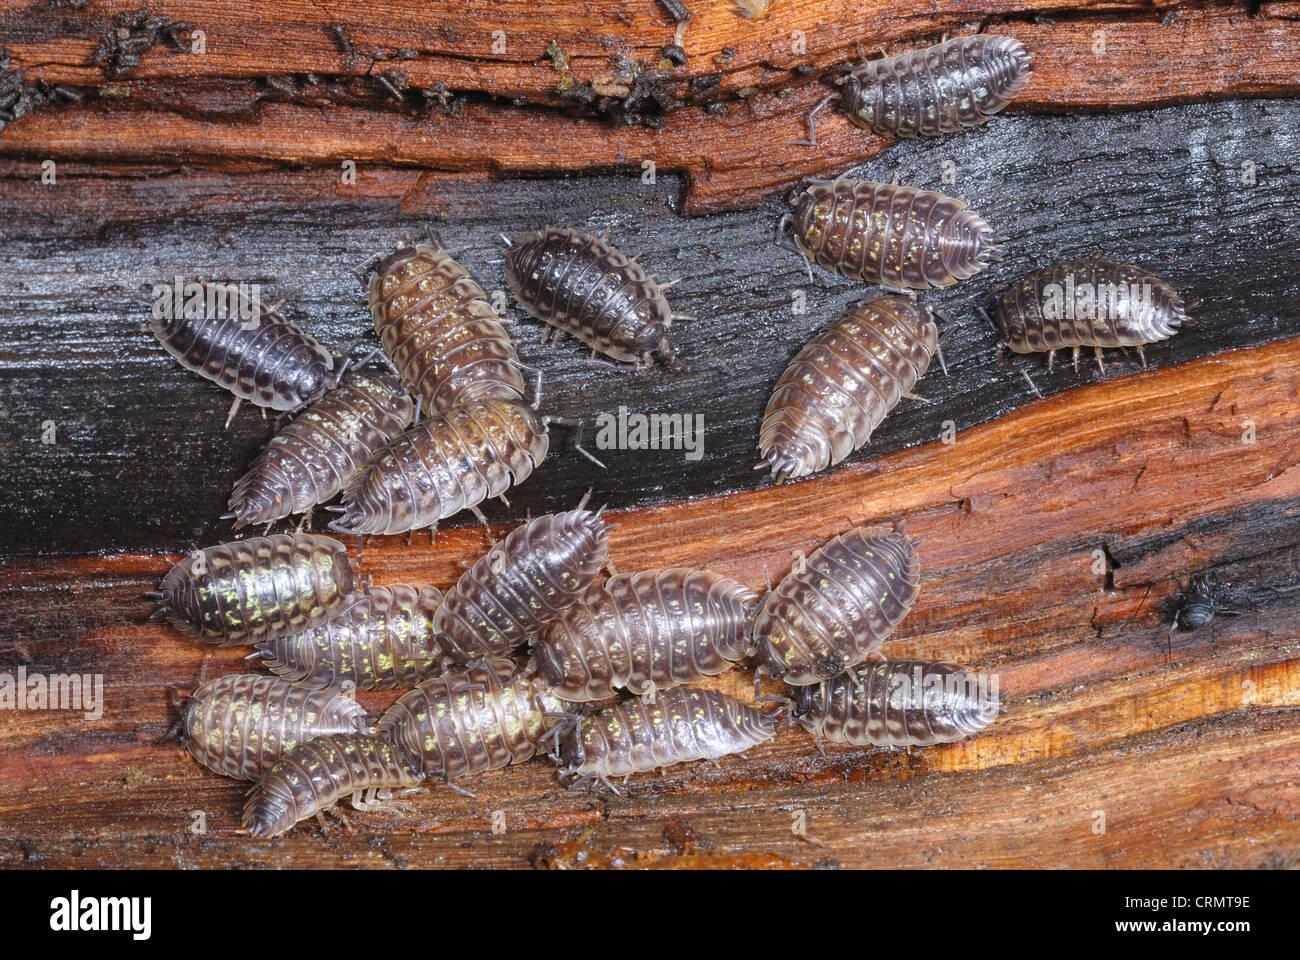 Jardín común (Woodlice Oniscus asellus) alimentándose de una podredumbre log Imagen De Stock